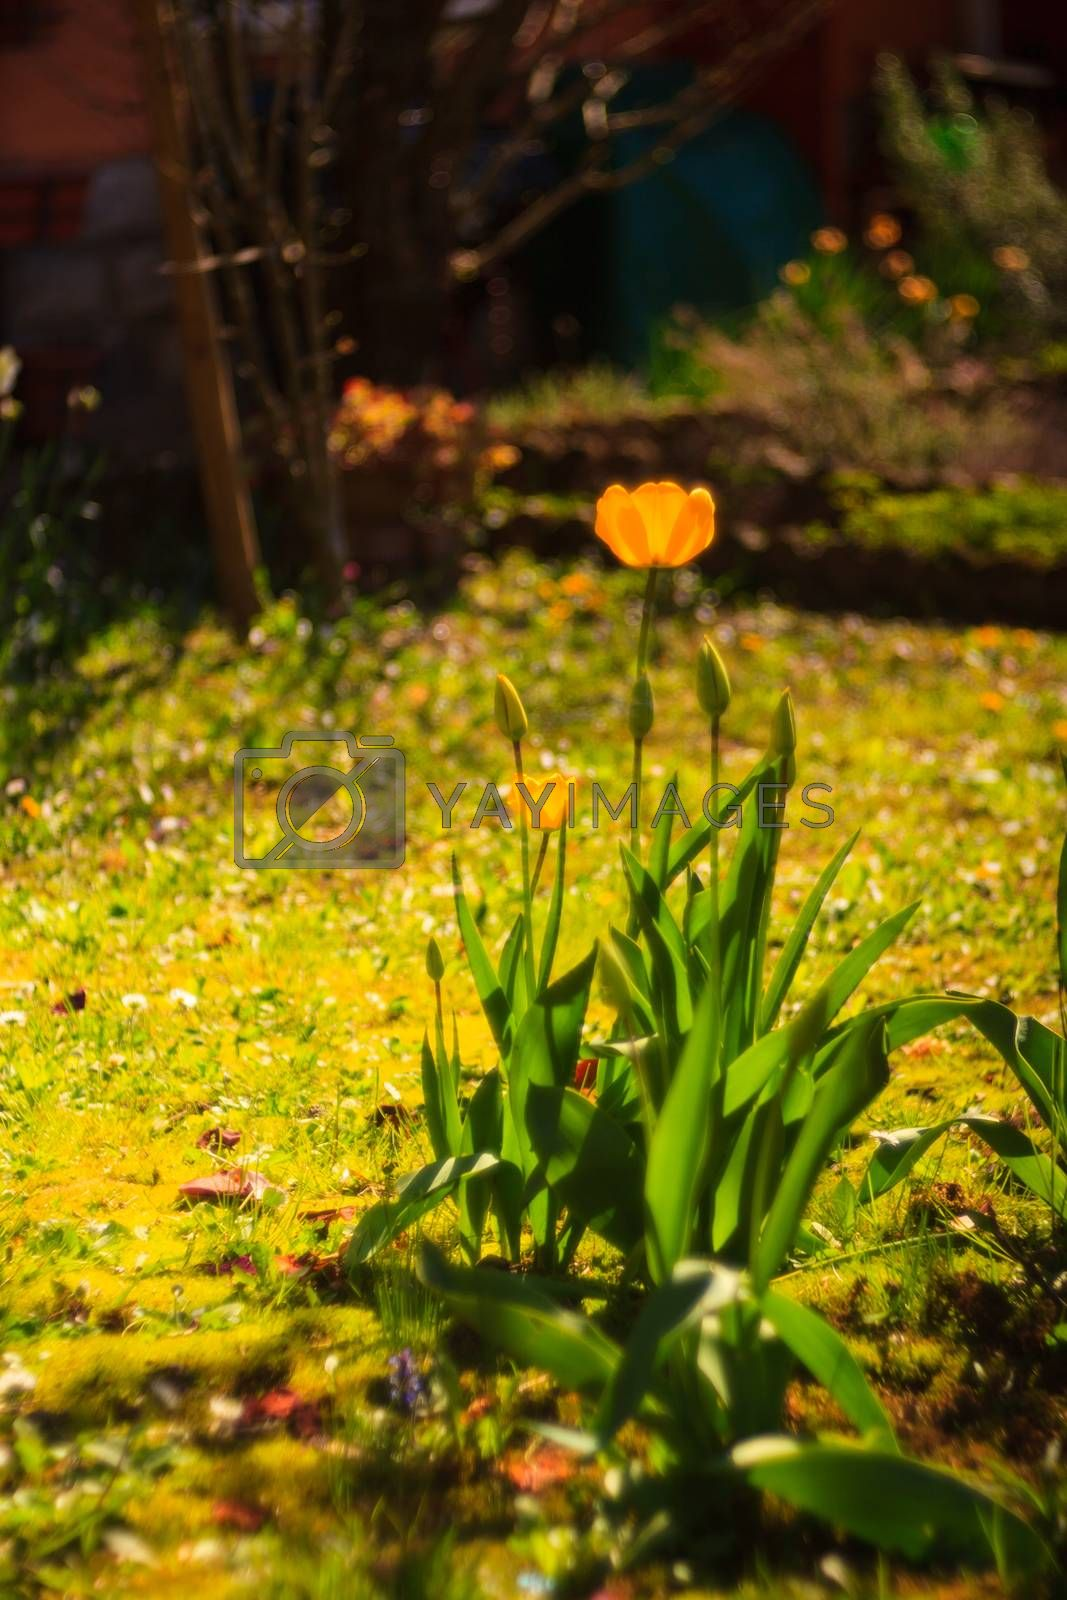 View of yellow tulip in the garden